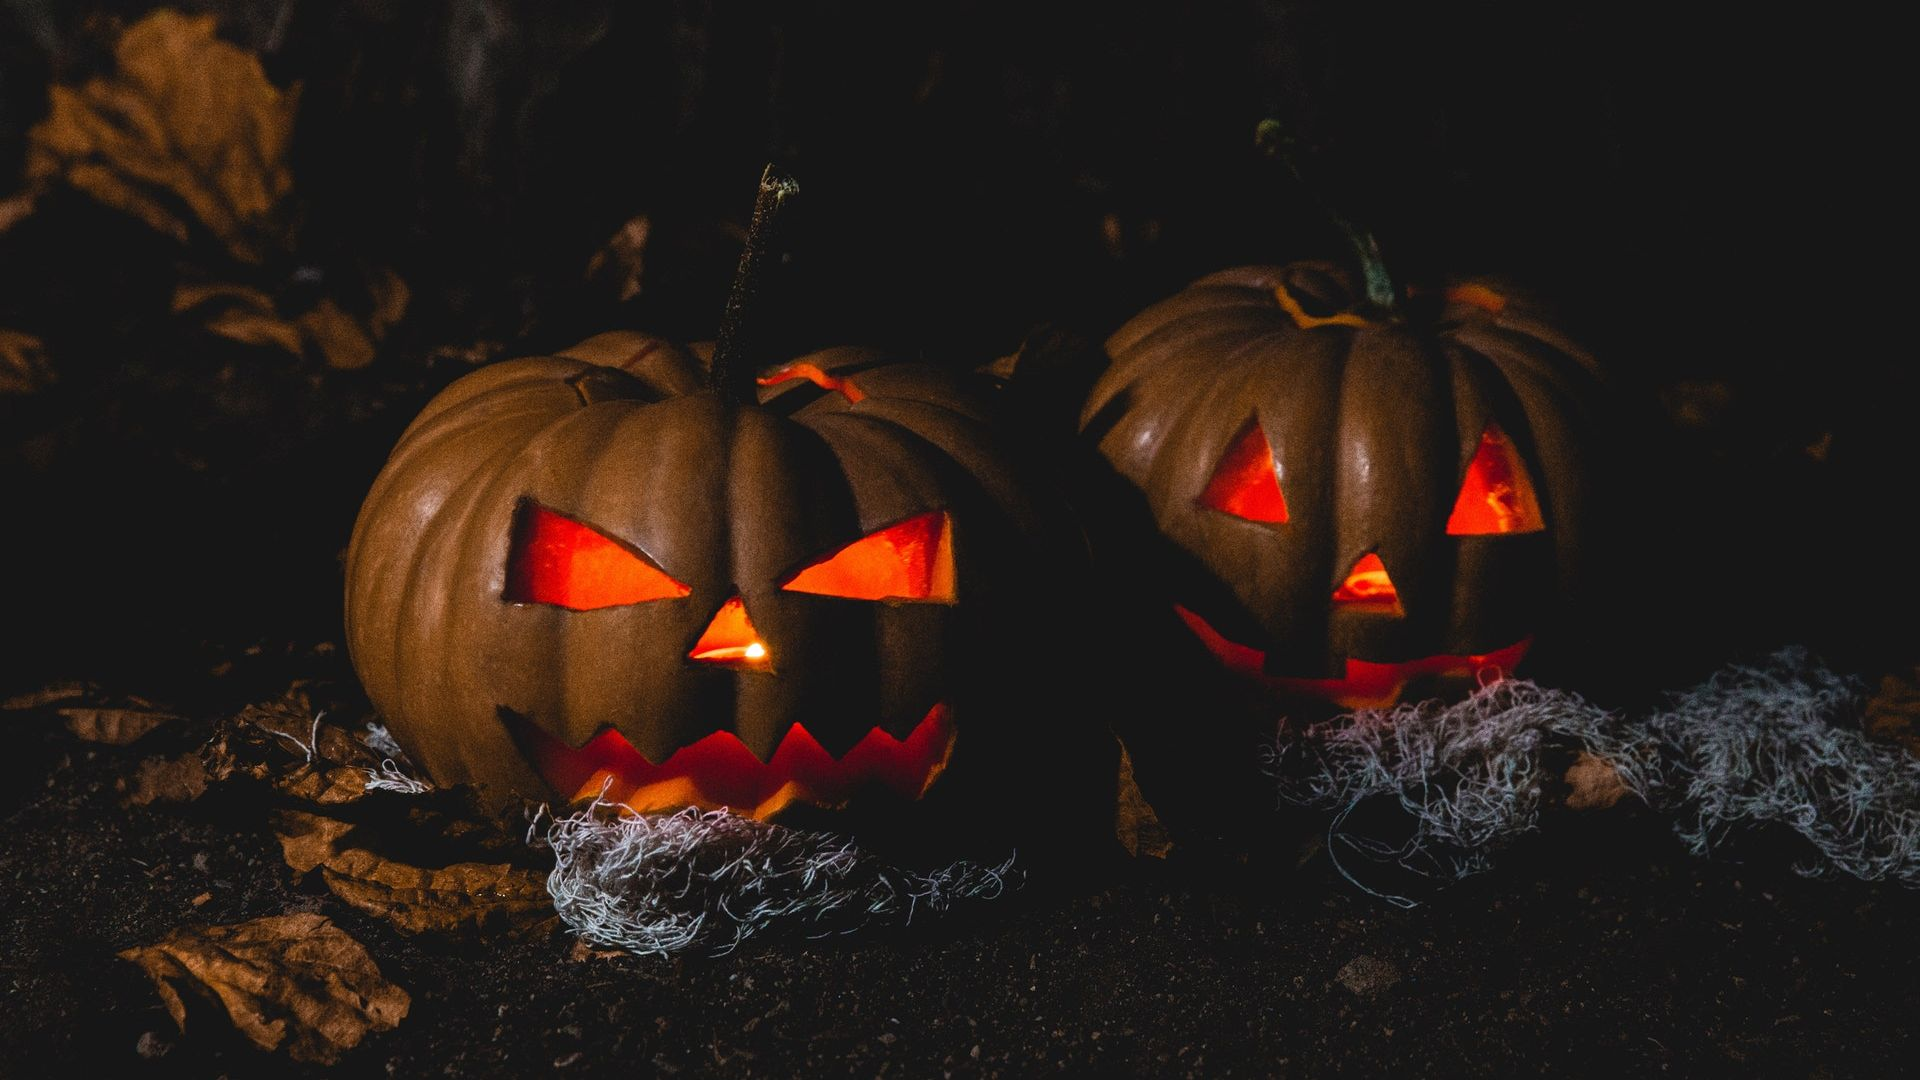 Halloween Creepy Dark Night HD Wallpaper   Wallpaper Stream 1920x1080